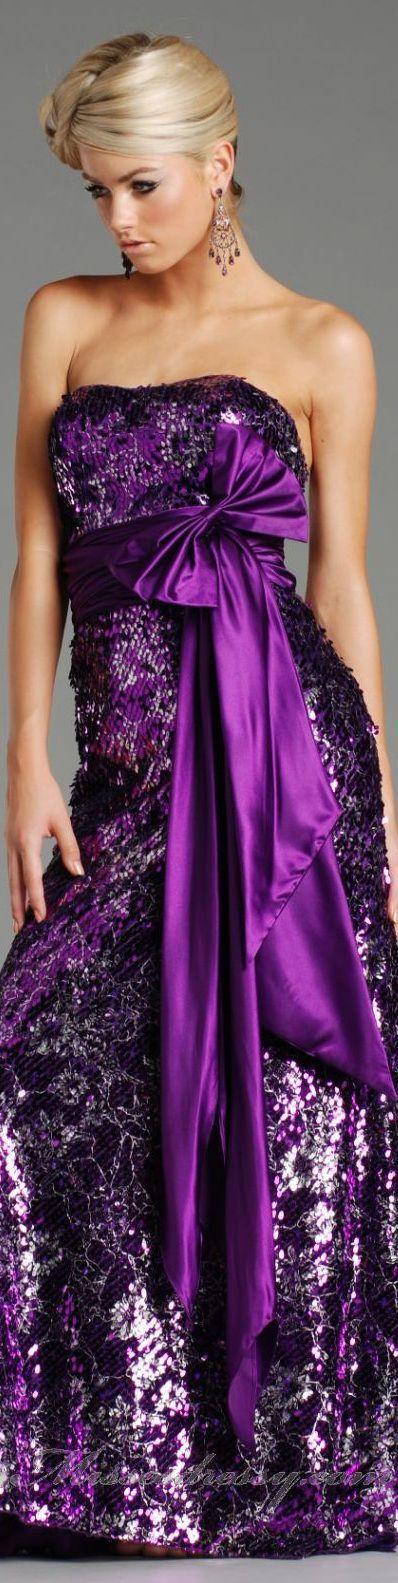 c6e014da2addca1ccdcc792642451f3f.jpg (398×1583) | Fashion details ...